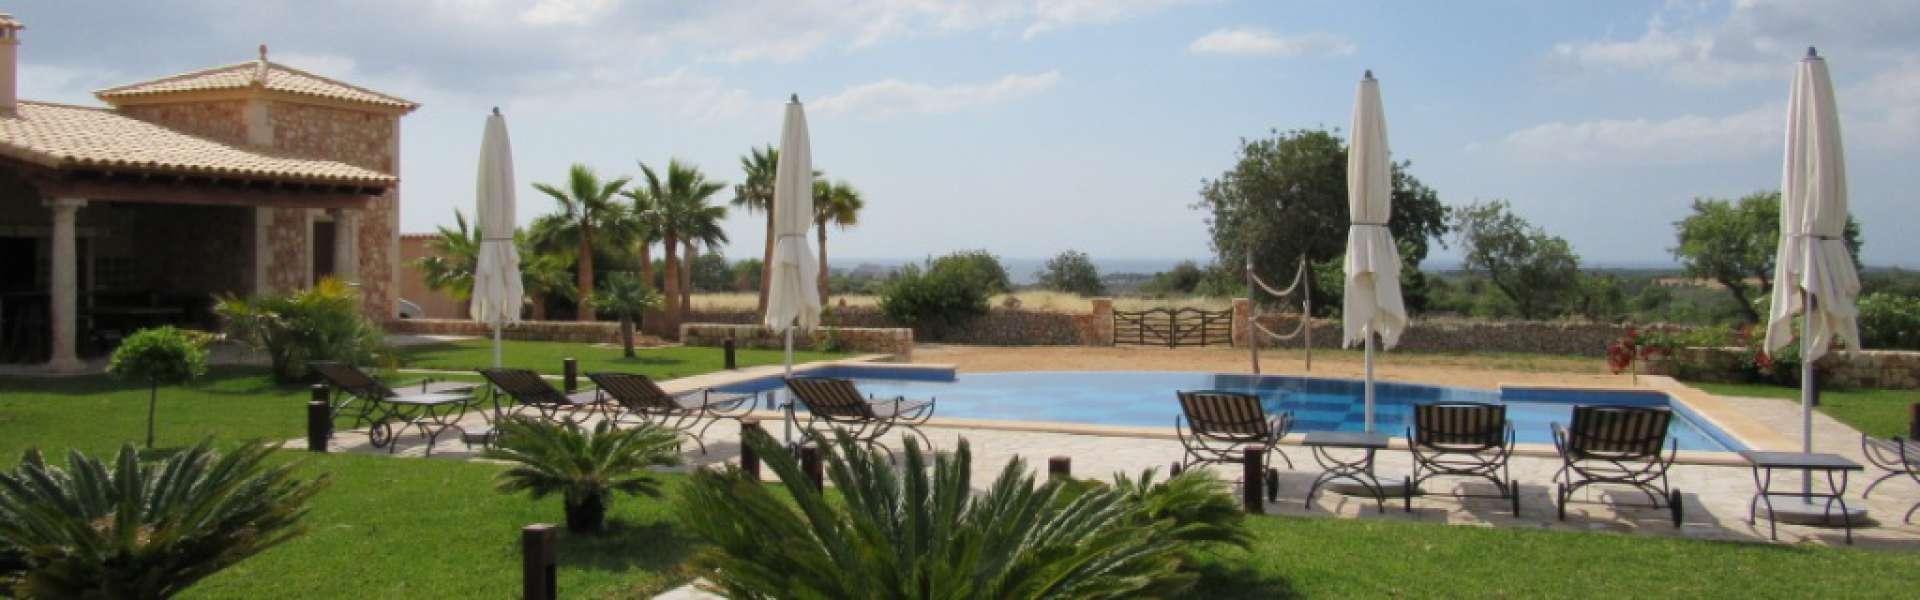 Porto Colom - Großzügige Finca nahe Calas de Mallorca zum Kauf